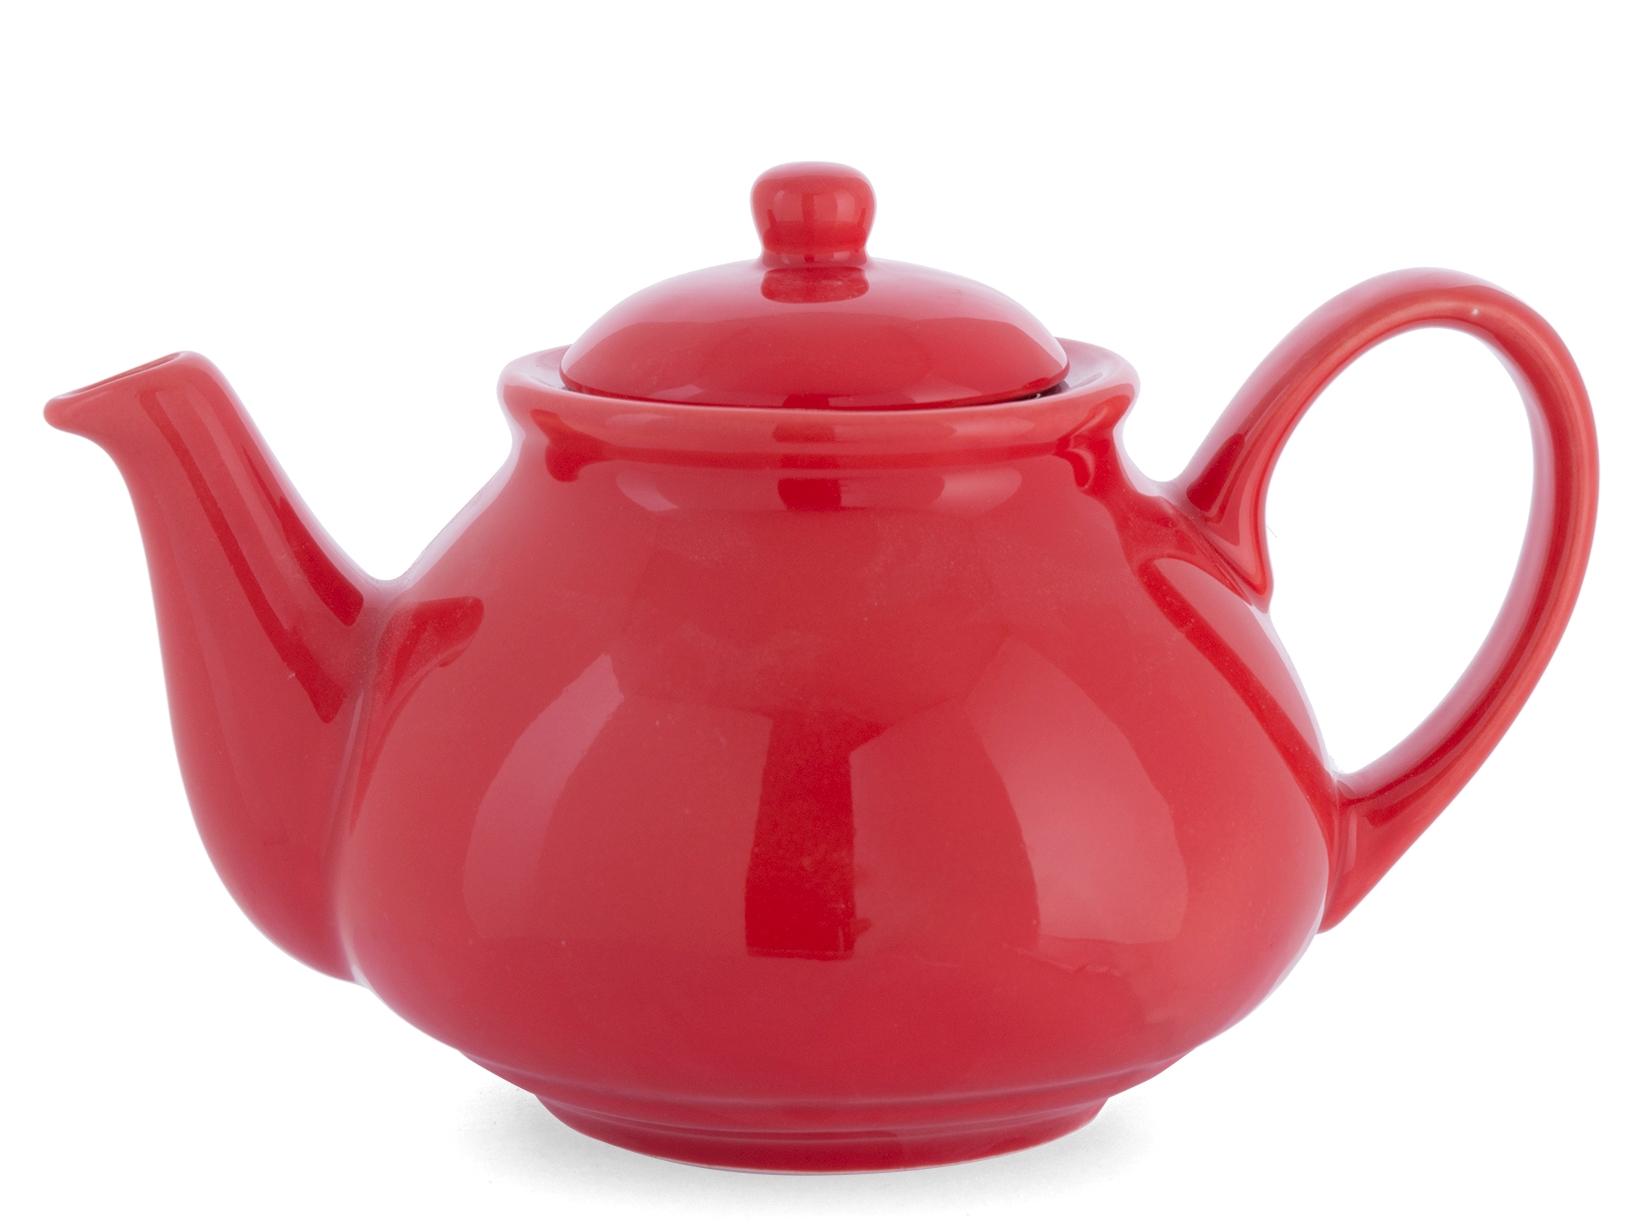 H&h Teiera In Ceramica Rossa Cc 1100